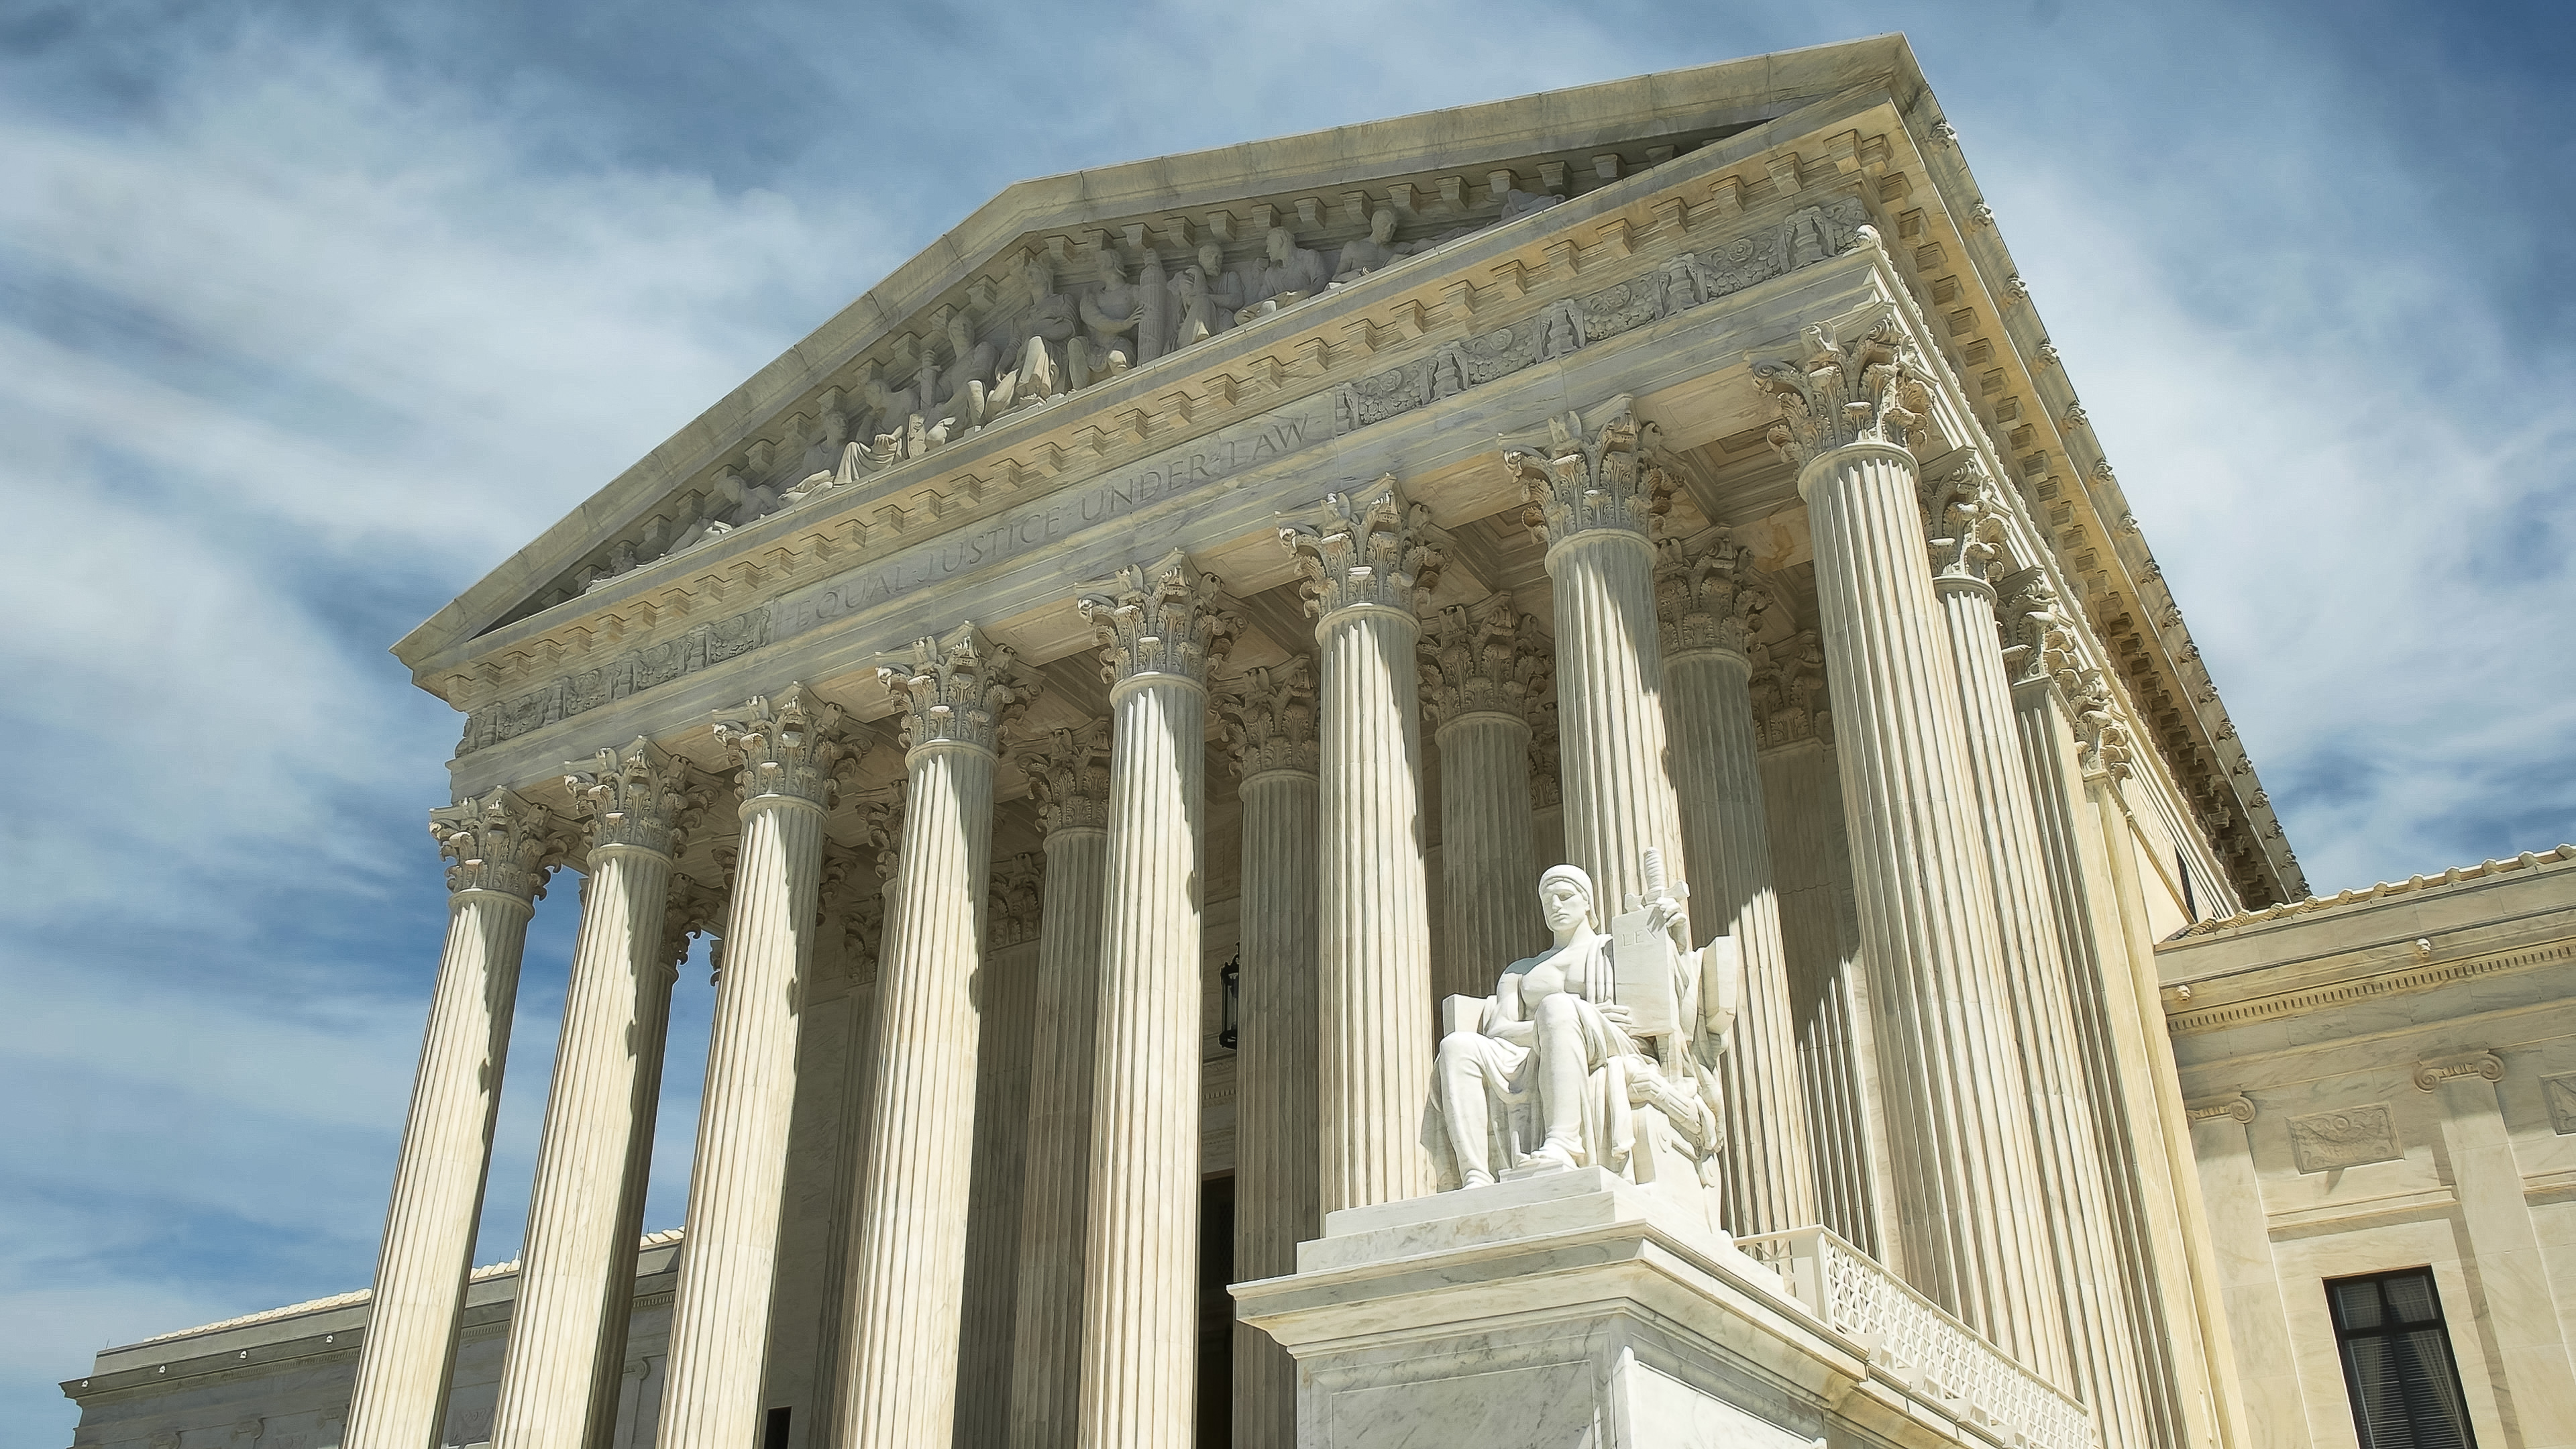 oblique shot of the us supreme court in washington d.c.